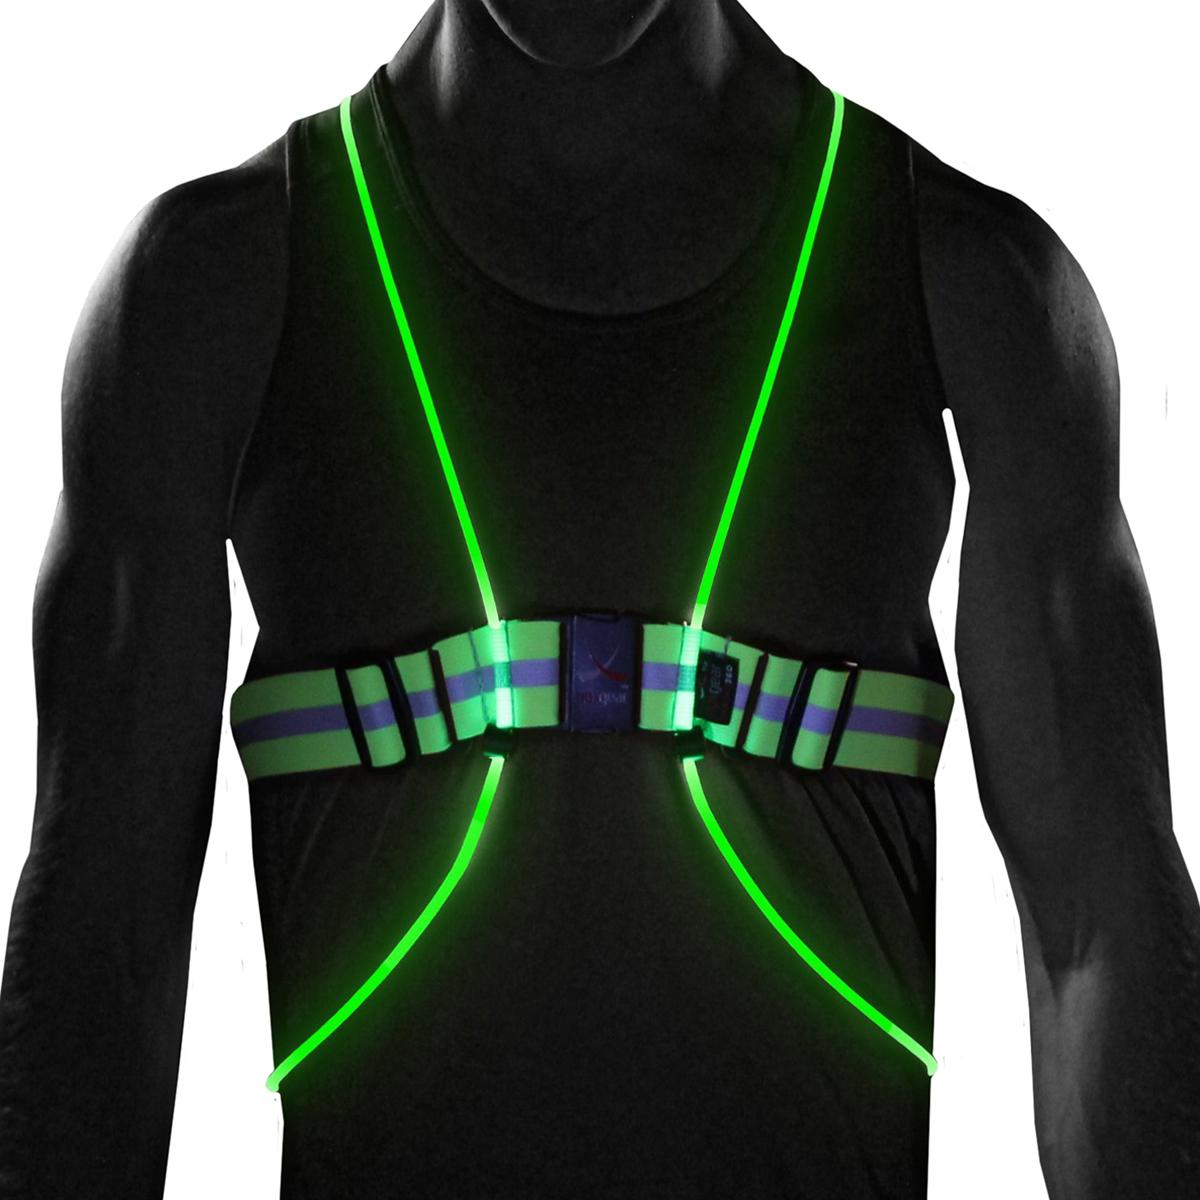 noxgear tracer360 multicolored illuminated reflective visibility running vest ebay. Black Bedroom Furniture Sets. Home Design Ideas